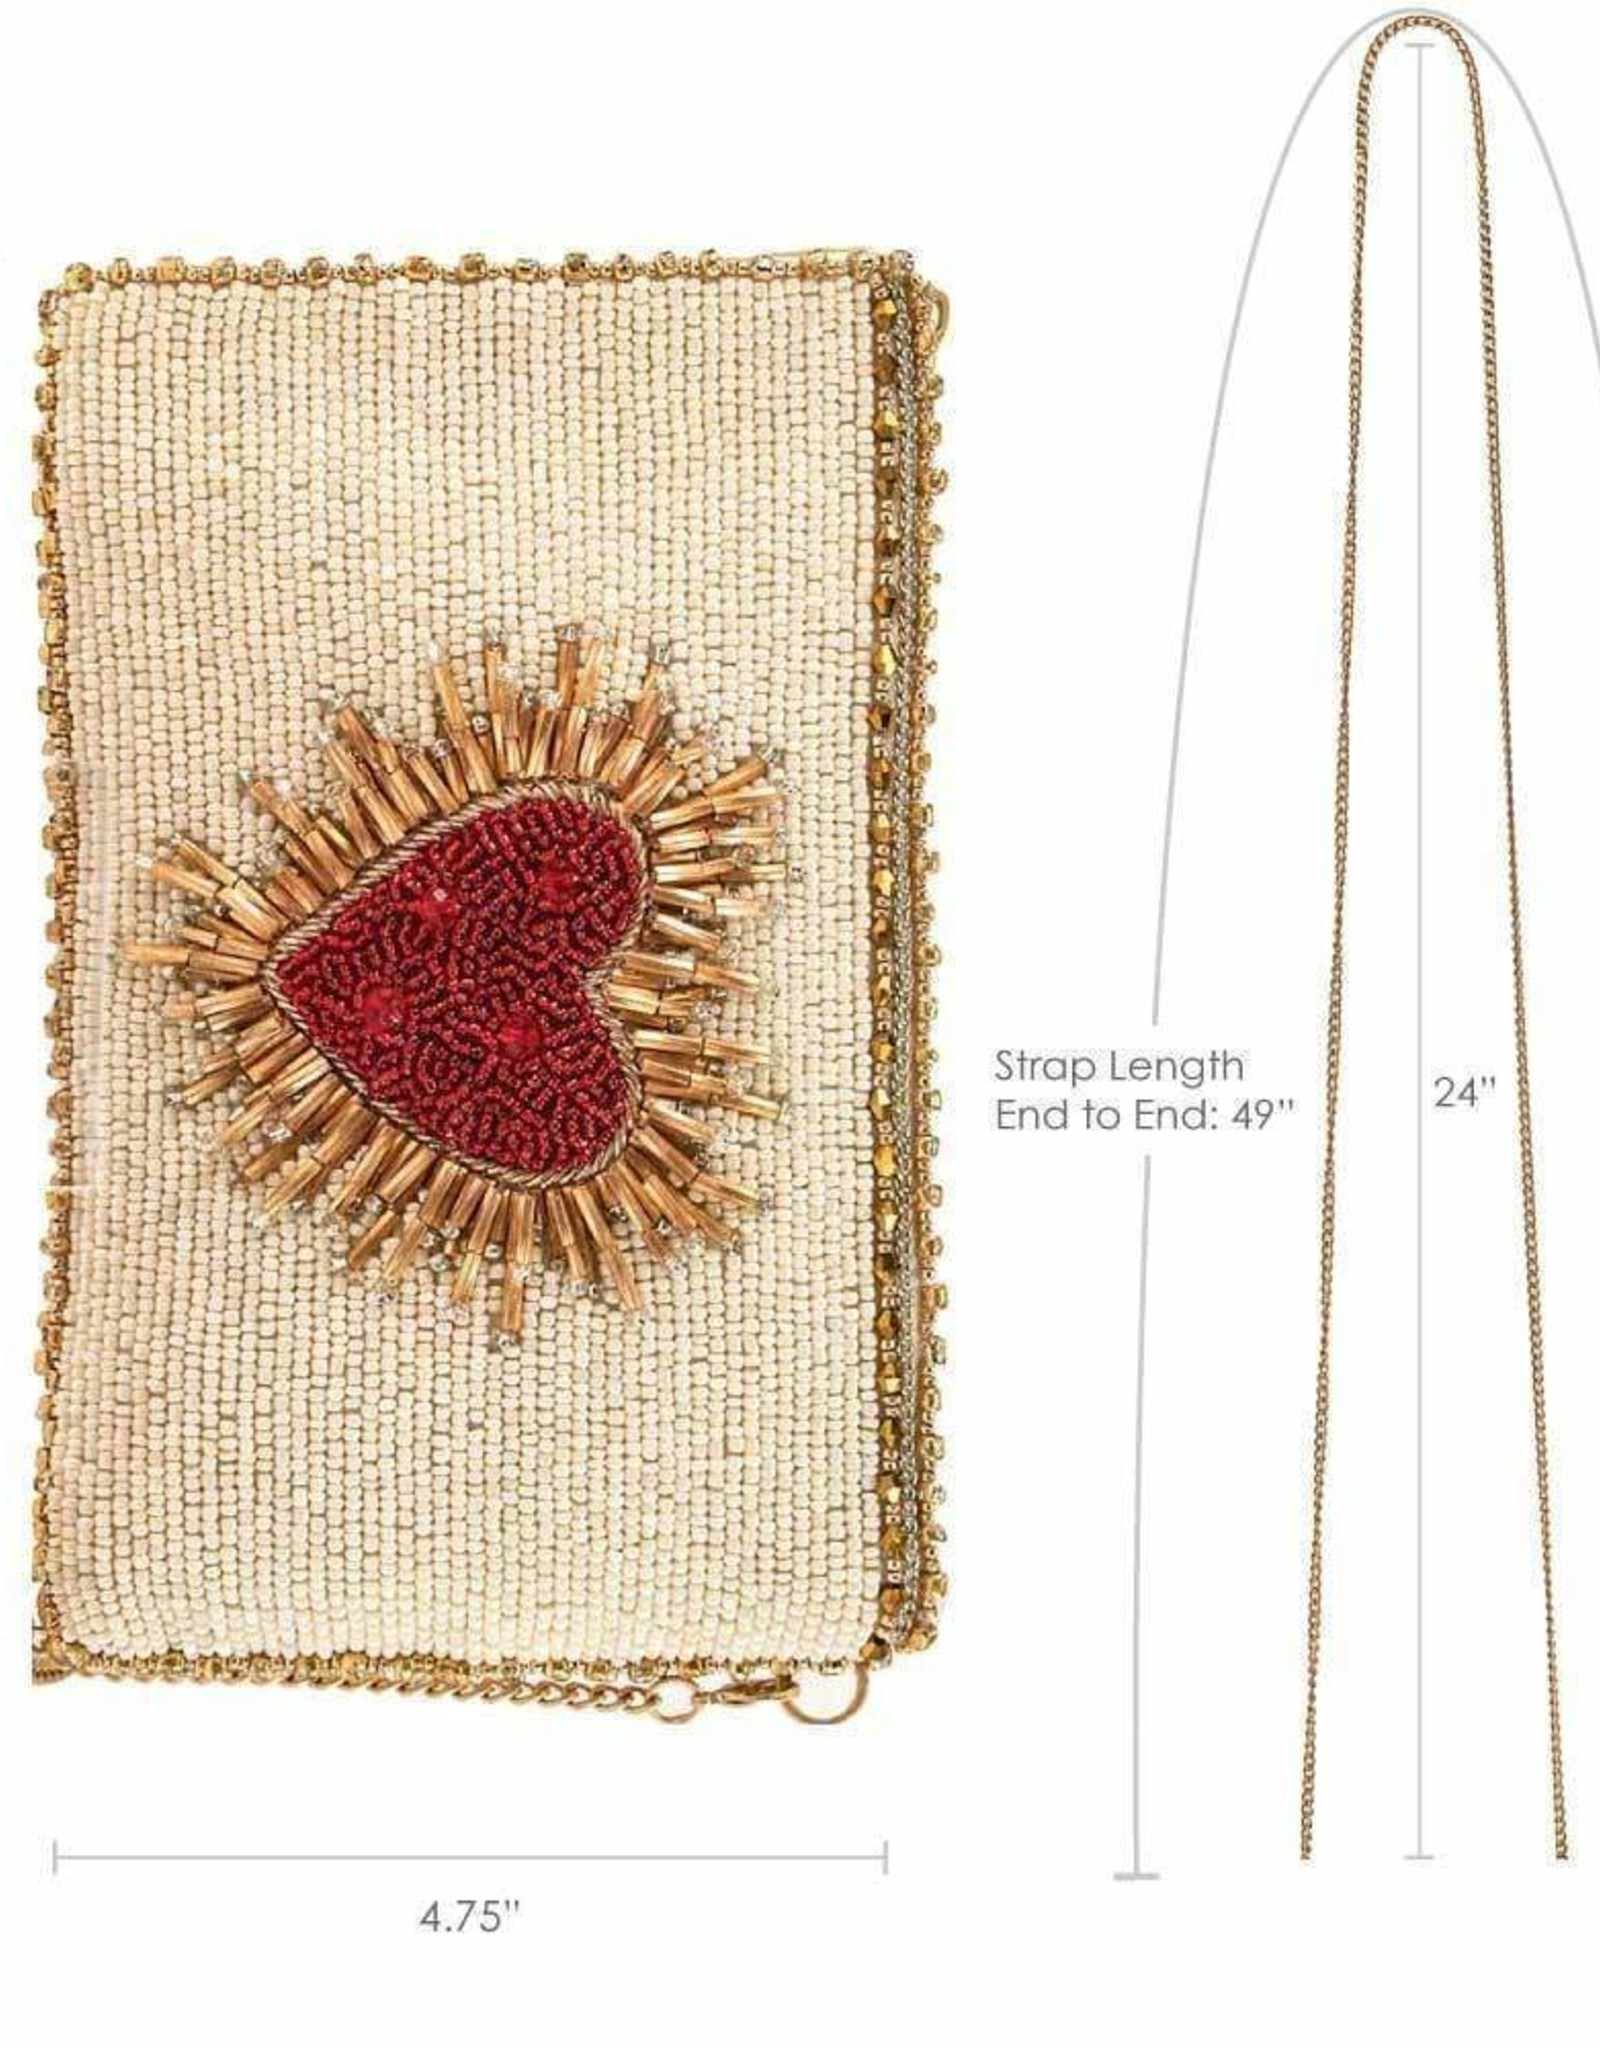 Mary Frances Mary Frances Phone Crossbody Bag HEART BURST